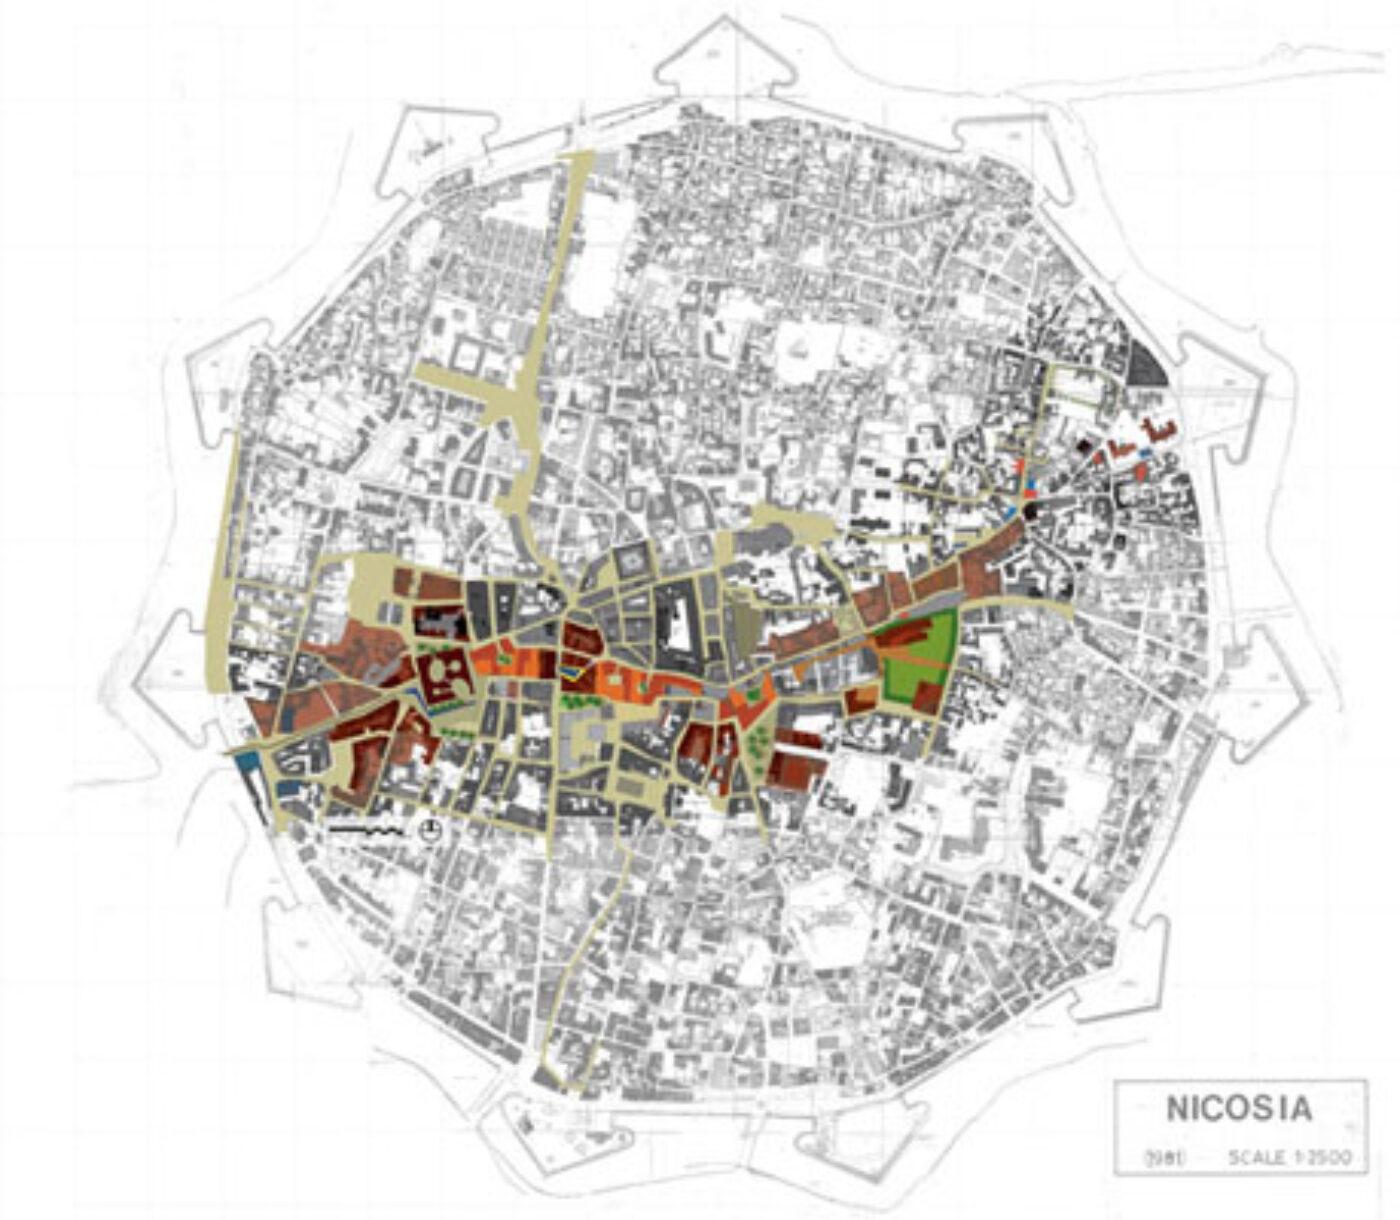 CYPRUS: Beyond the Green Line-Nicosia